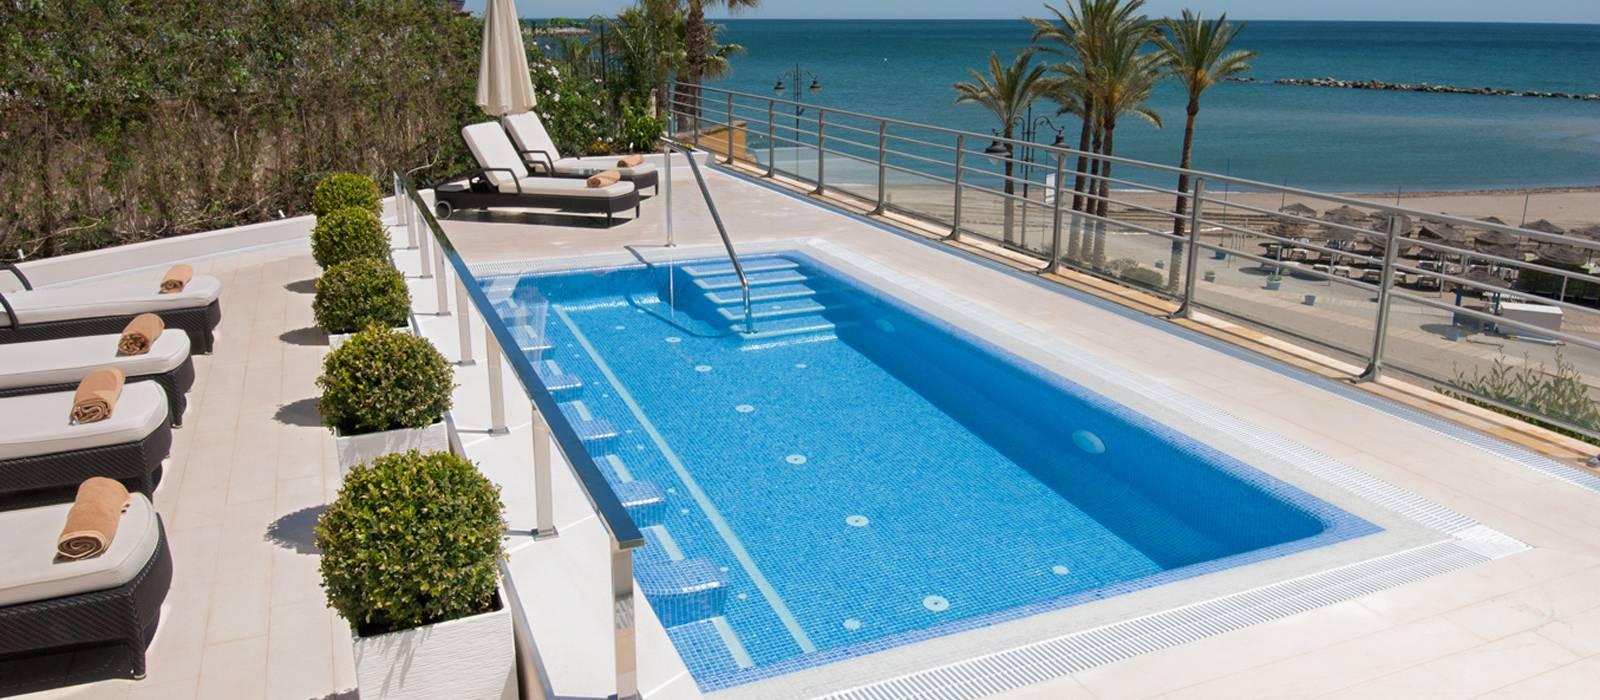 Services Hotel Vincci Aleysa Boutique&Spa - Outdoor pool and Jacuzzi